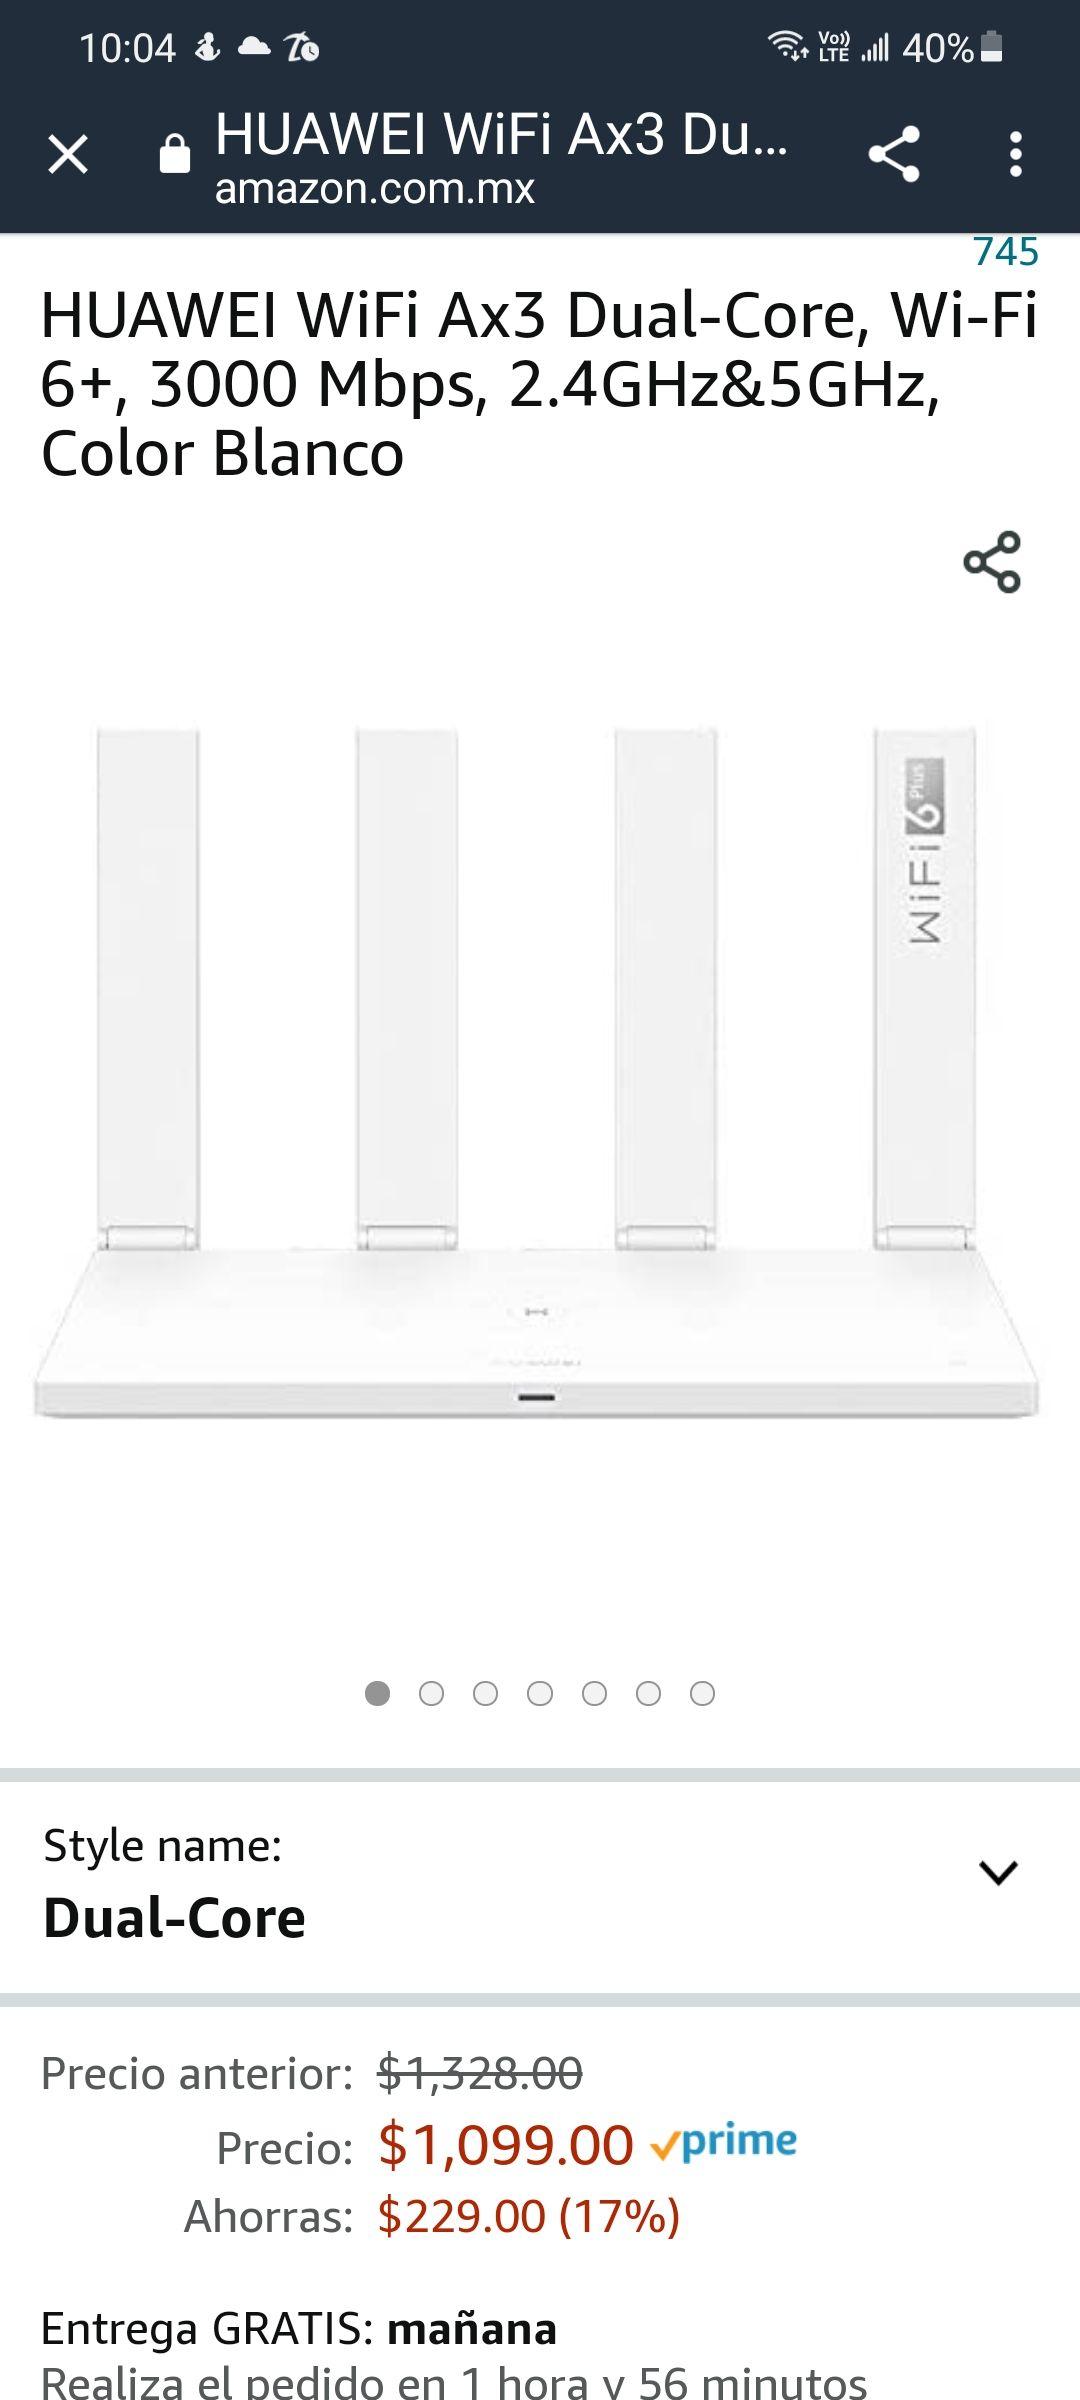 Amazon: HUAWEI WiFi Ax3 Dual-Core, Wi-Fi 6+, 3000 Mbps, 2.4GHz&5GHz, Color Blanco